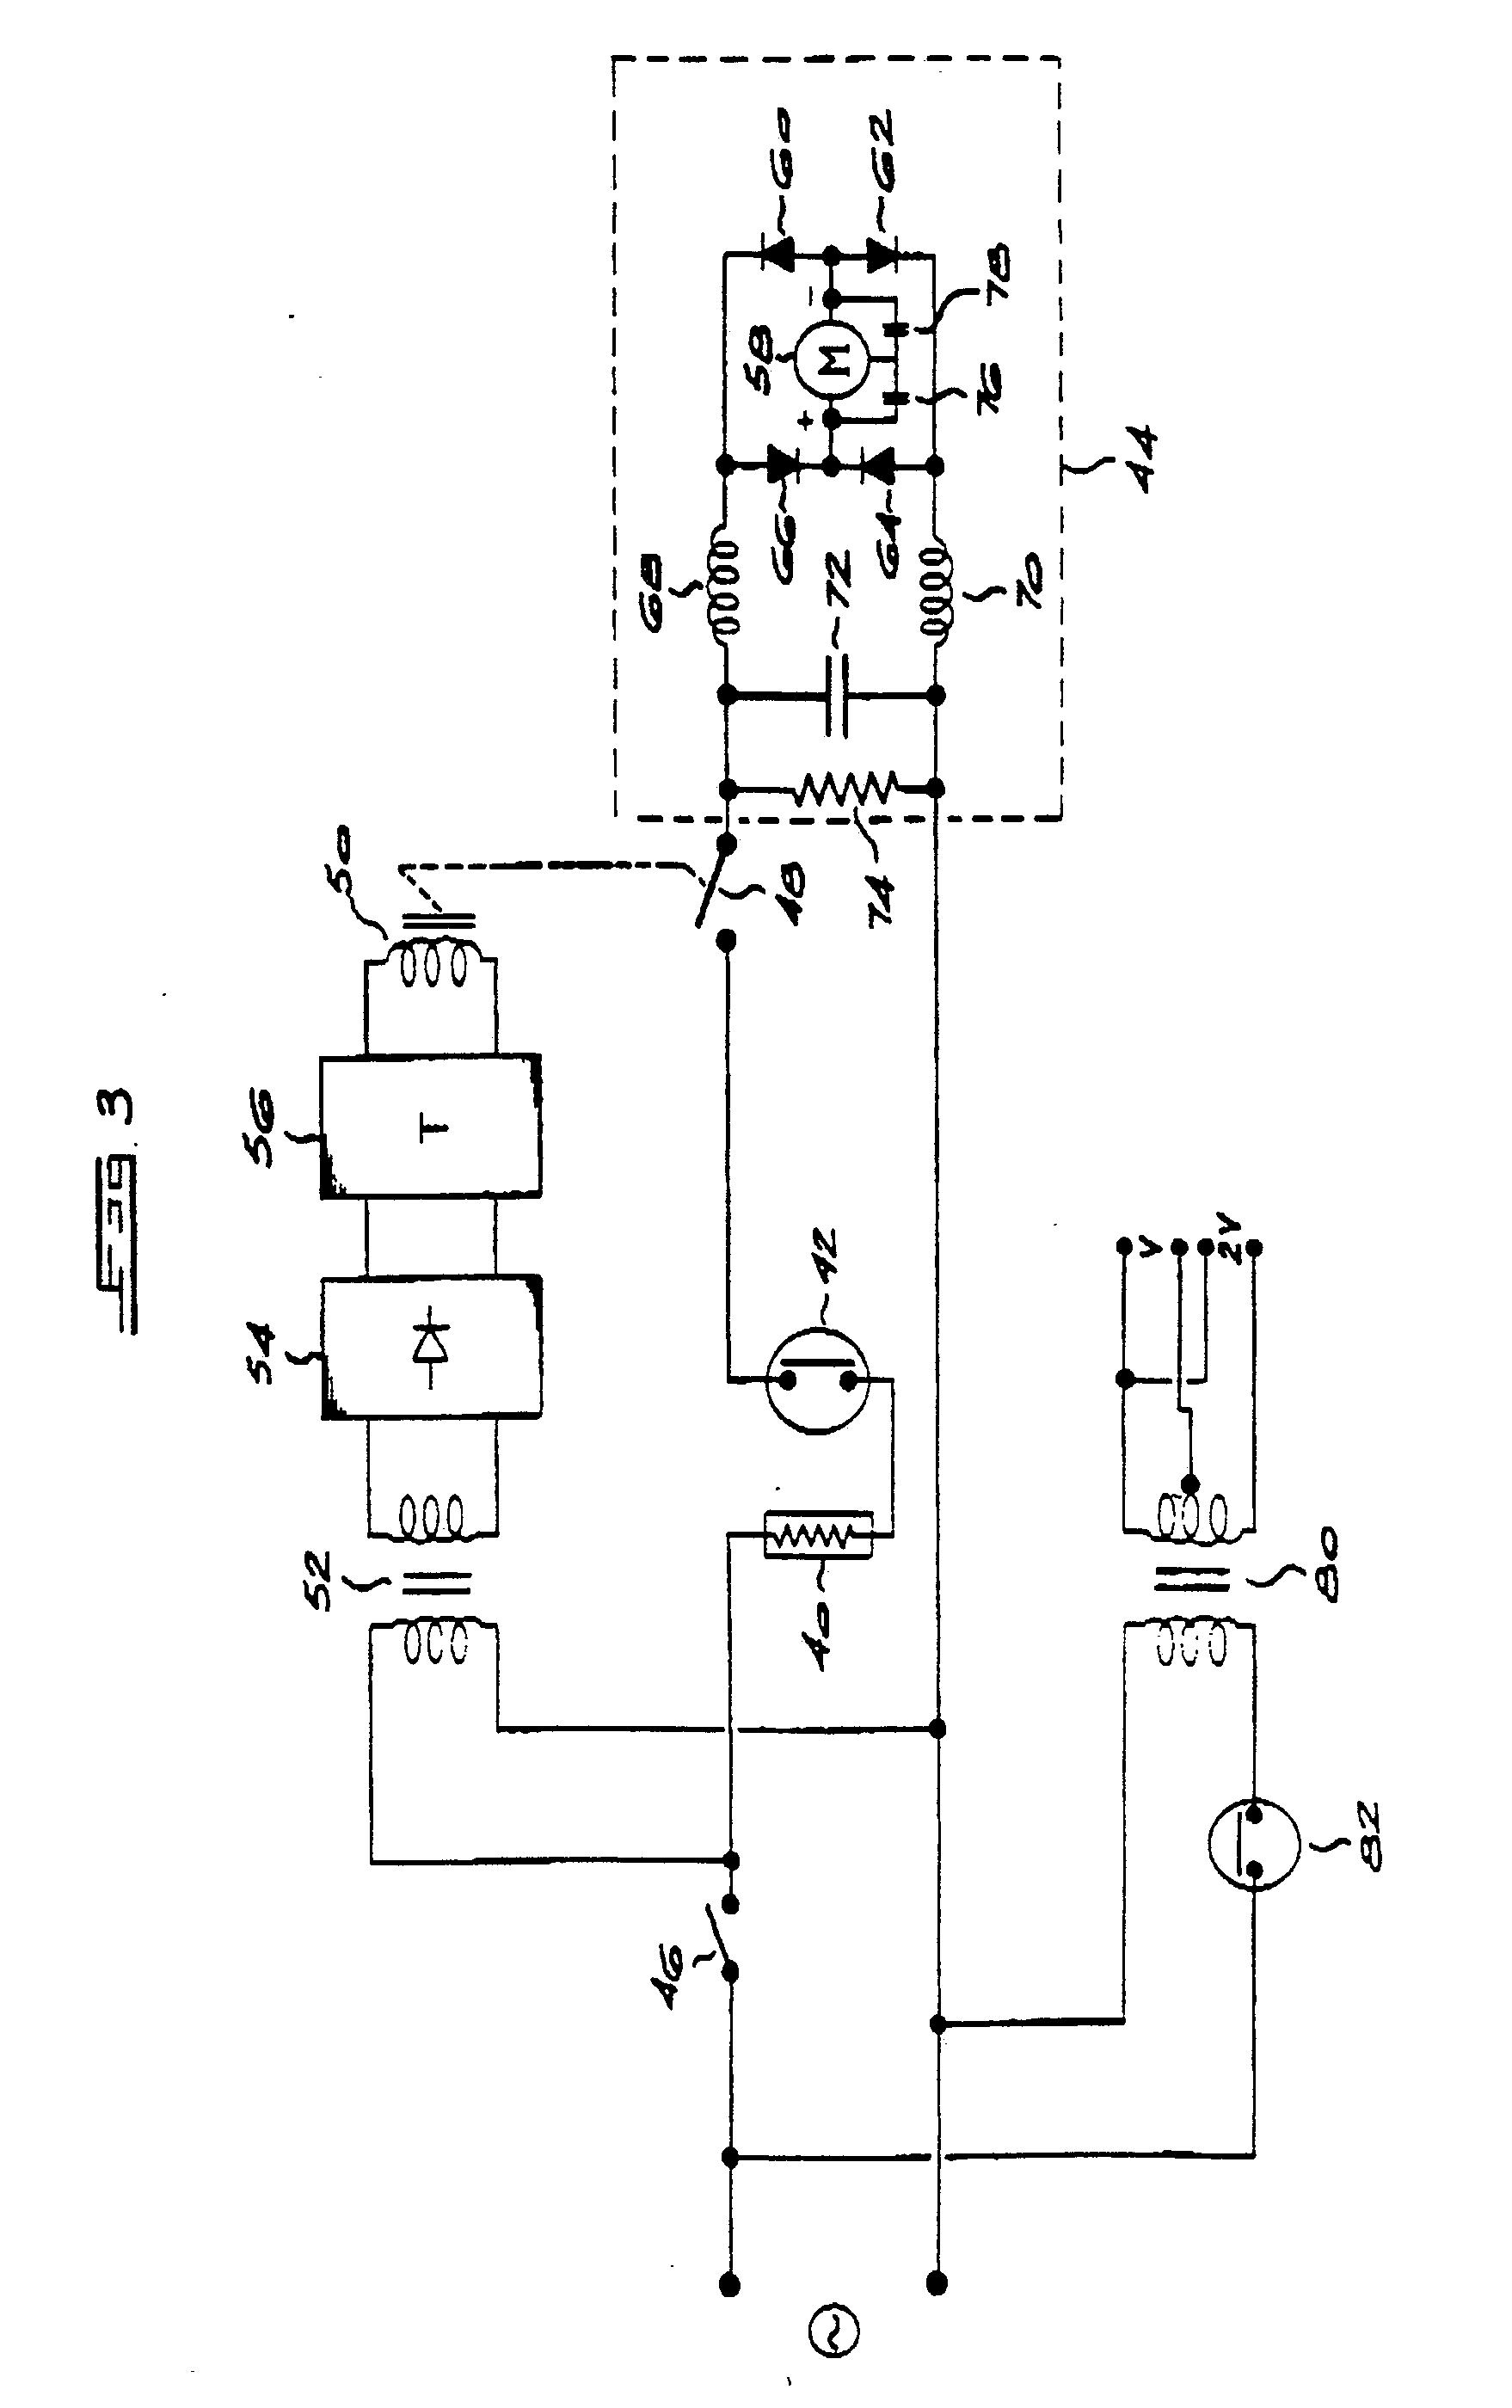 Le5700xsno Whirlpool Dryer Wiring Schematic Amana Dryer